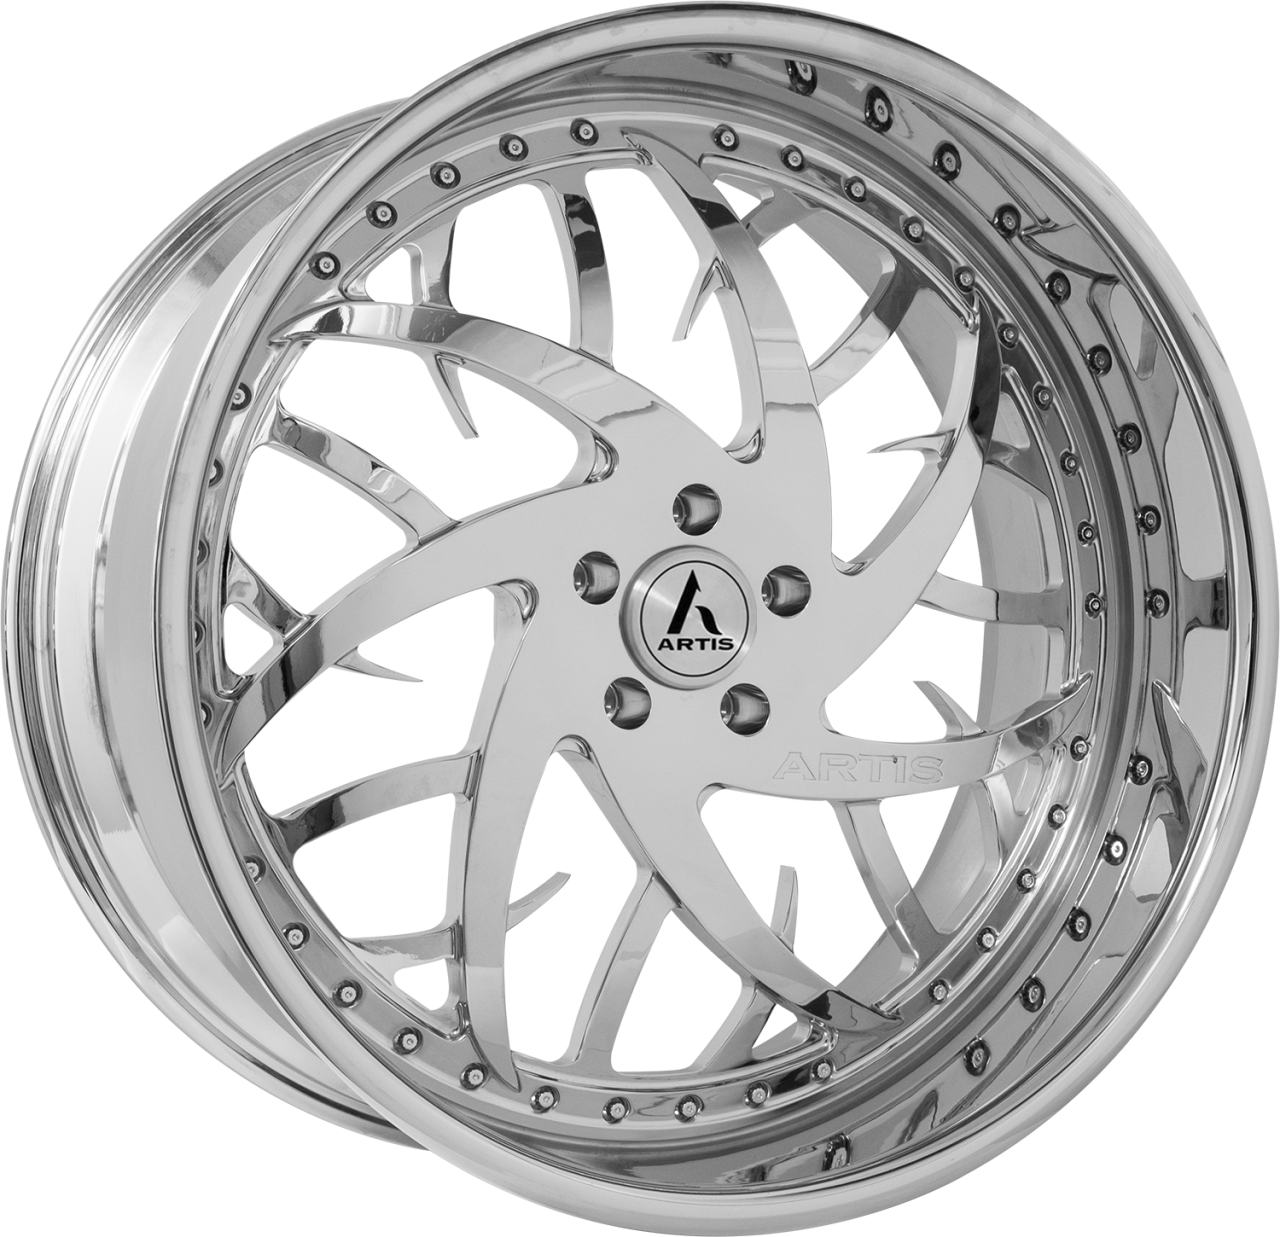 Artis Forged Harlem-M wheel with Chrome finish